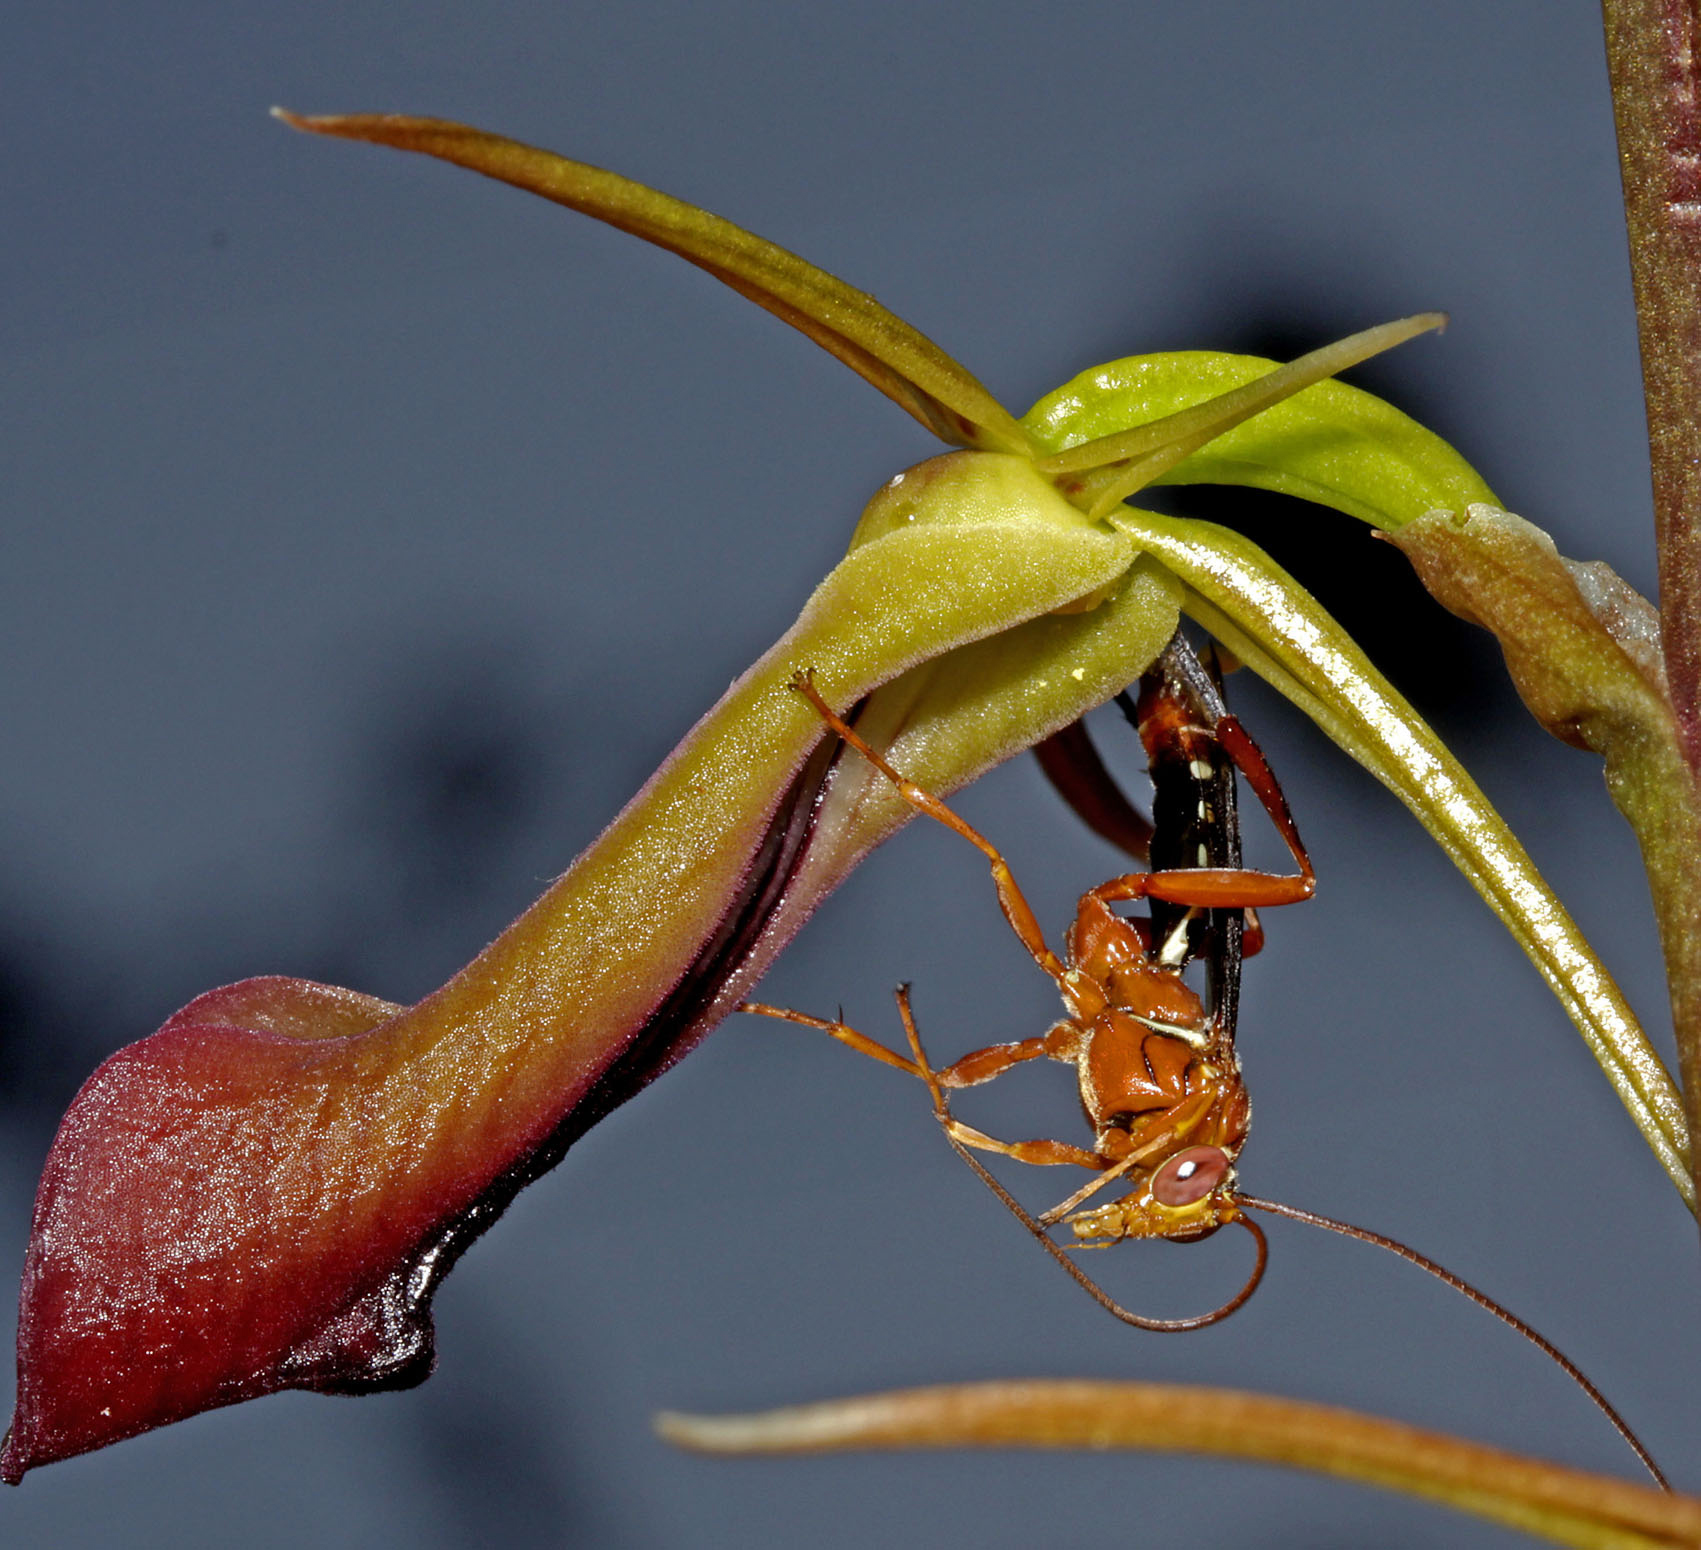 Cryptostylis Subulata & Wasp Photo: Mitch Smith